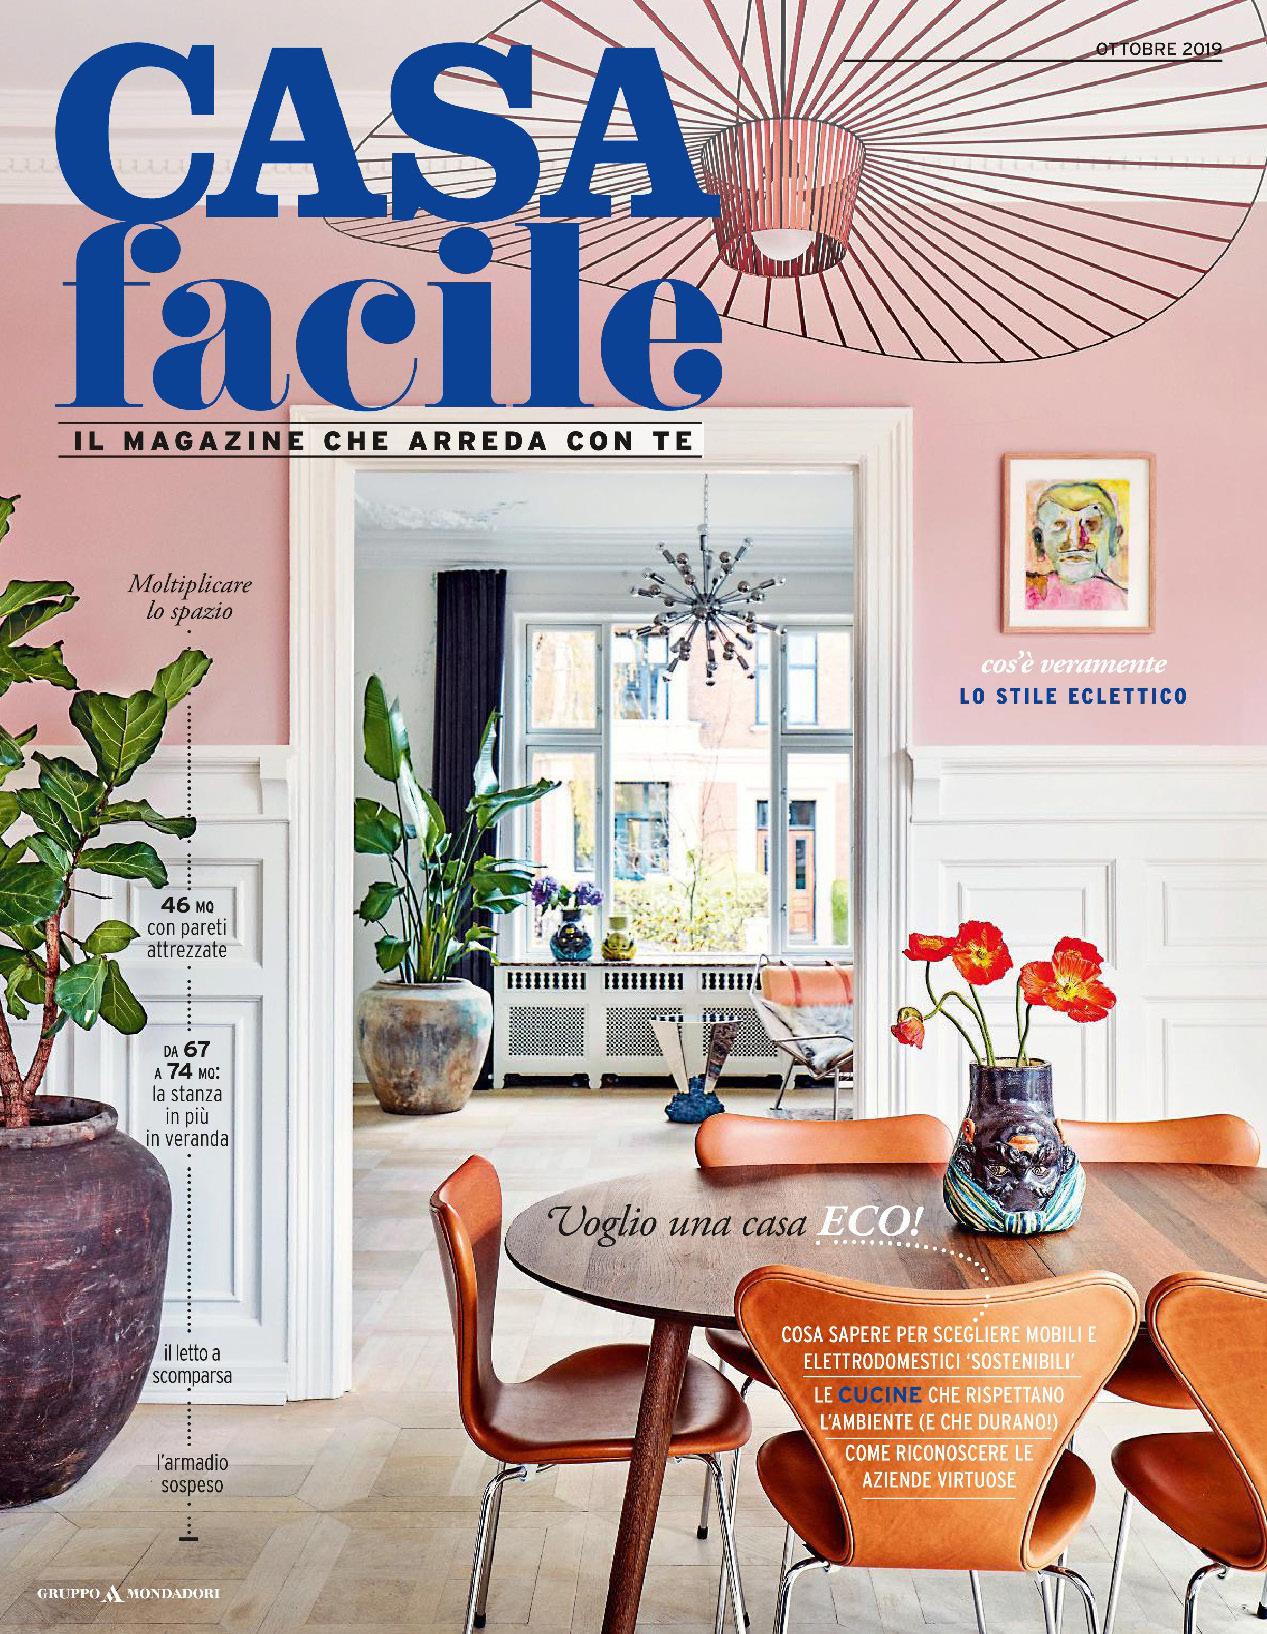 《Casa Facile》意大利家居空间装饰艺术杂志2019年10月号